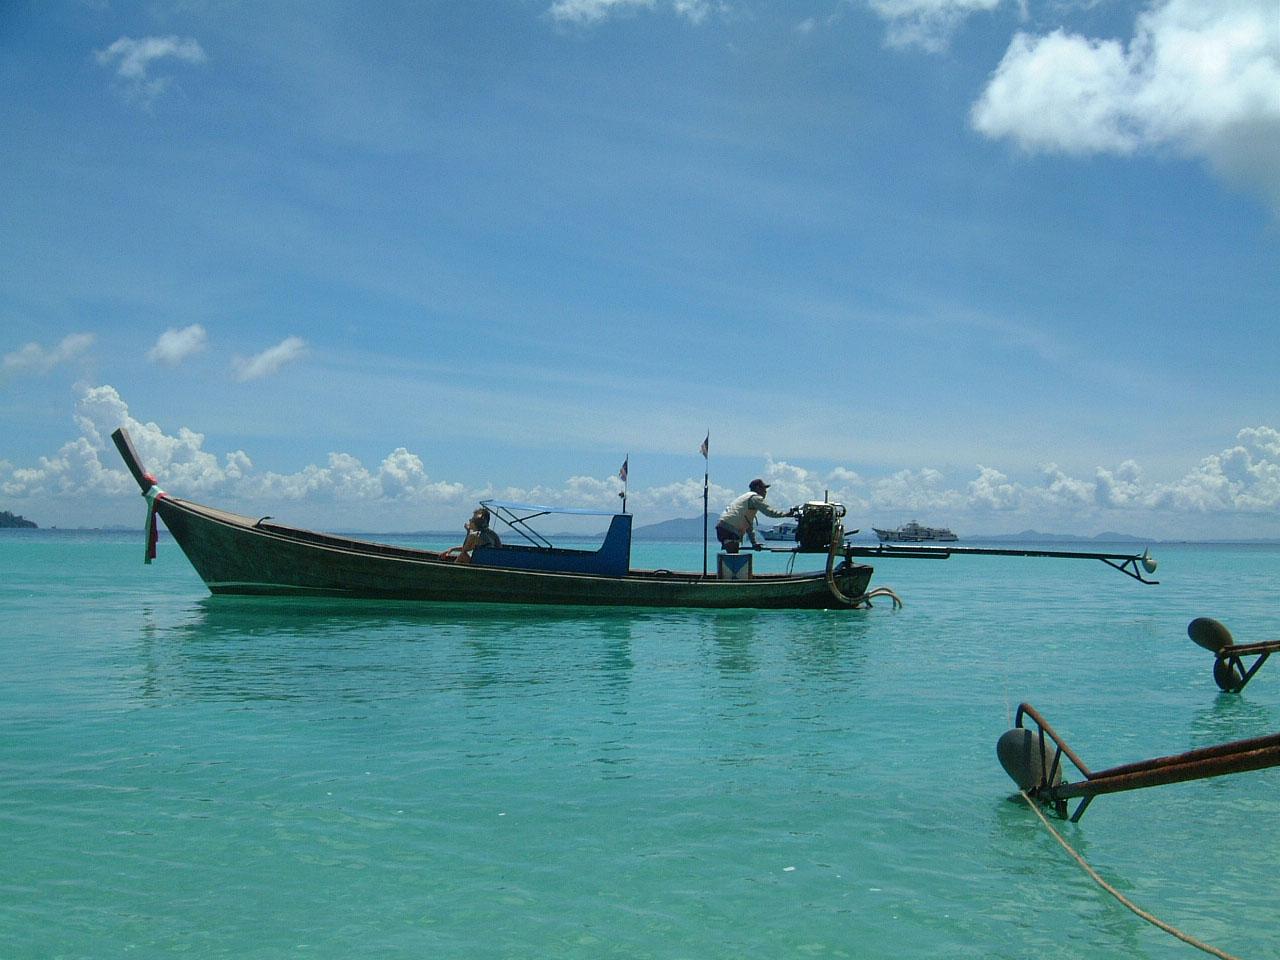 Thailand Phi Phi Island panoramic scenes Mar 2003 09